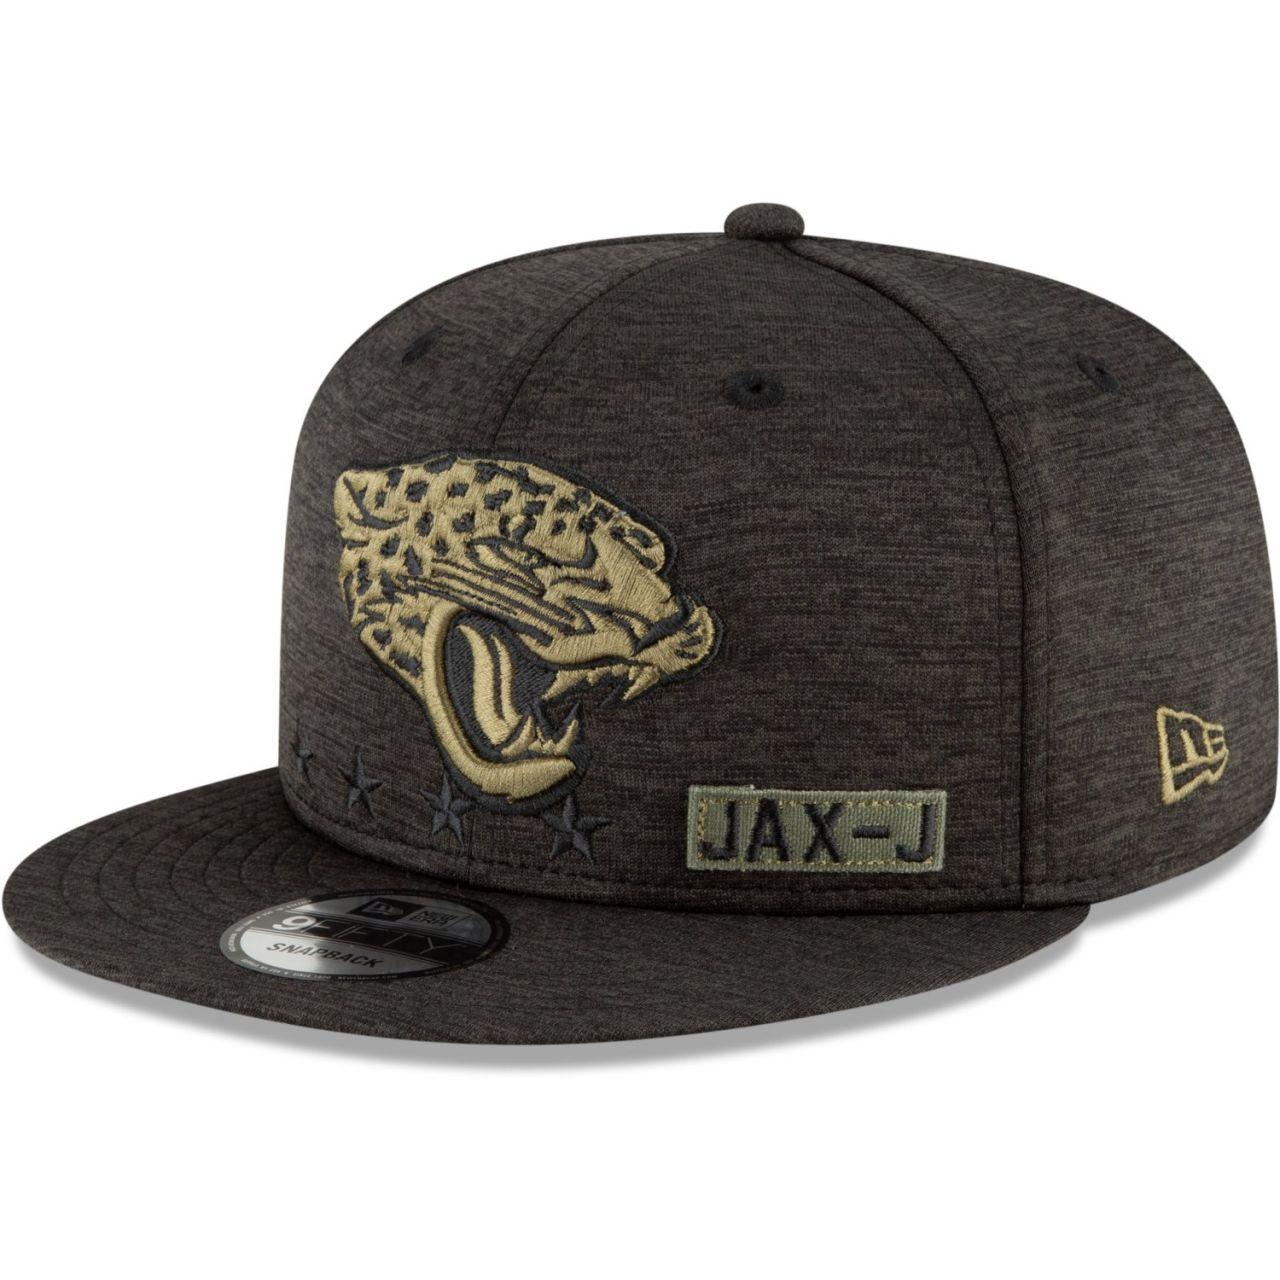 amfoo - New Era 9FIFTY Cap Salute to Service Jacksonville Jaguars